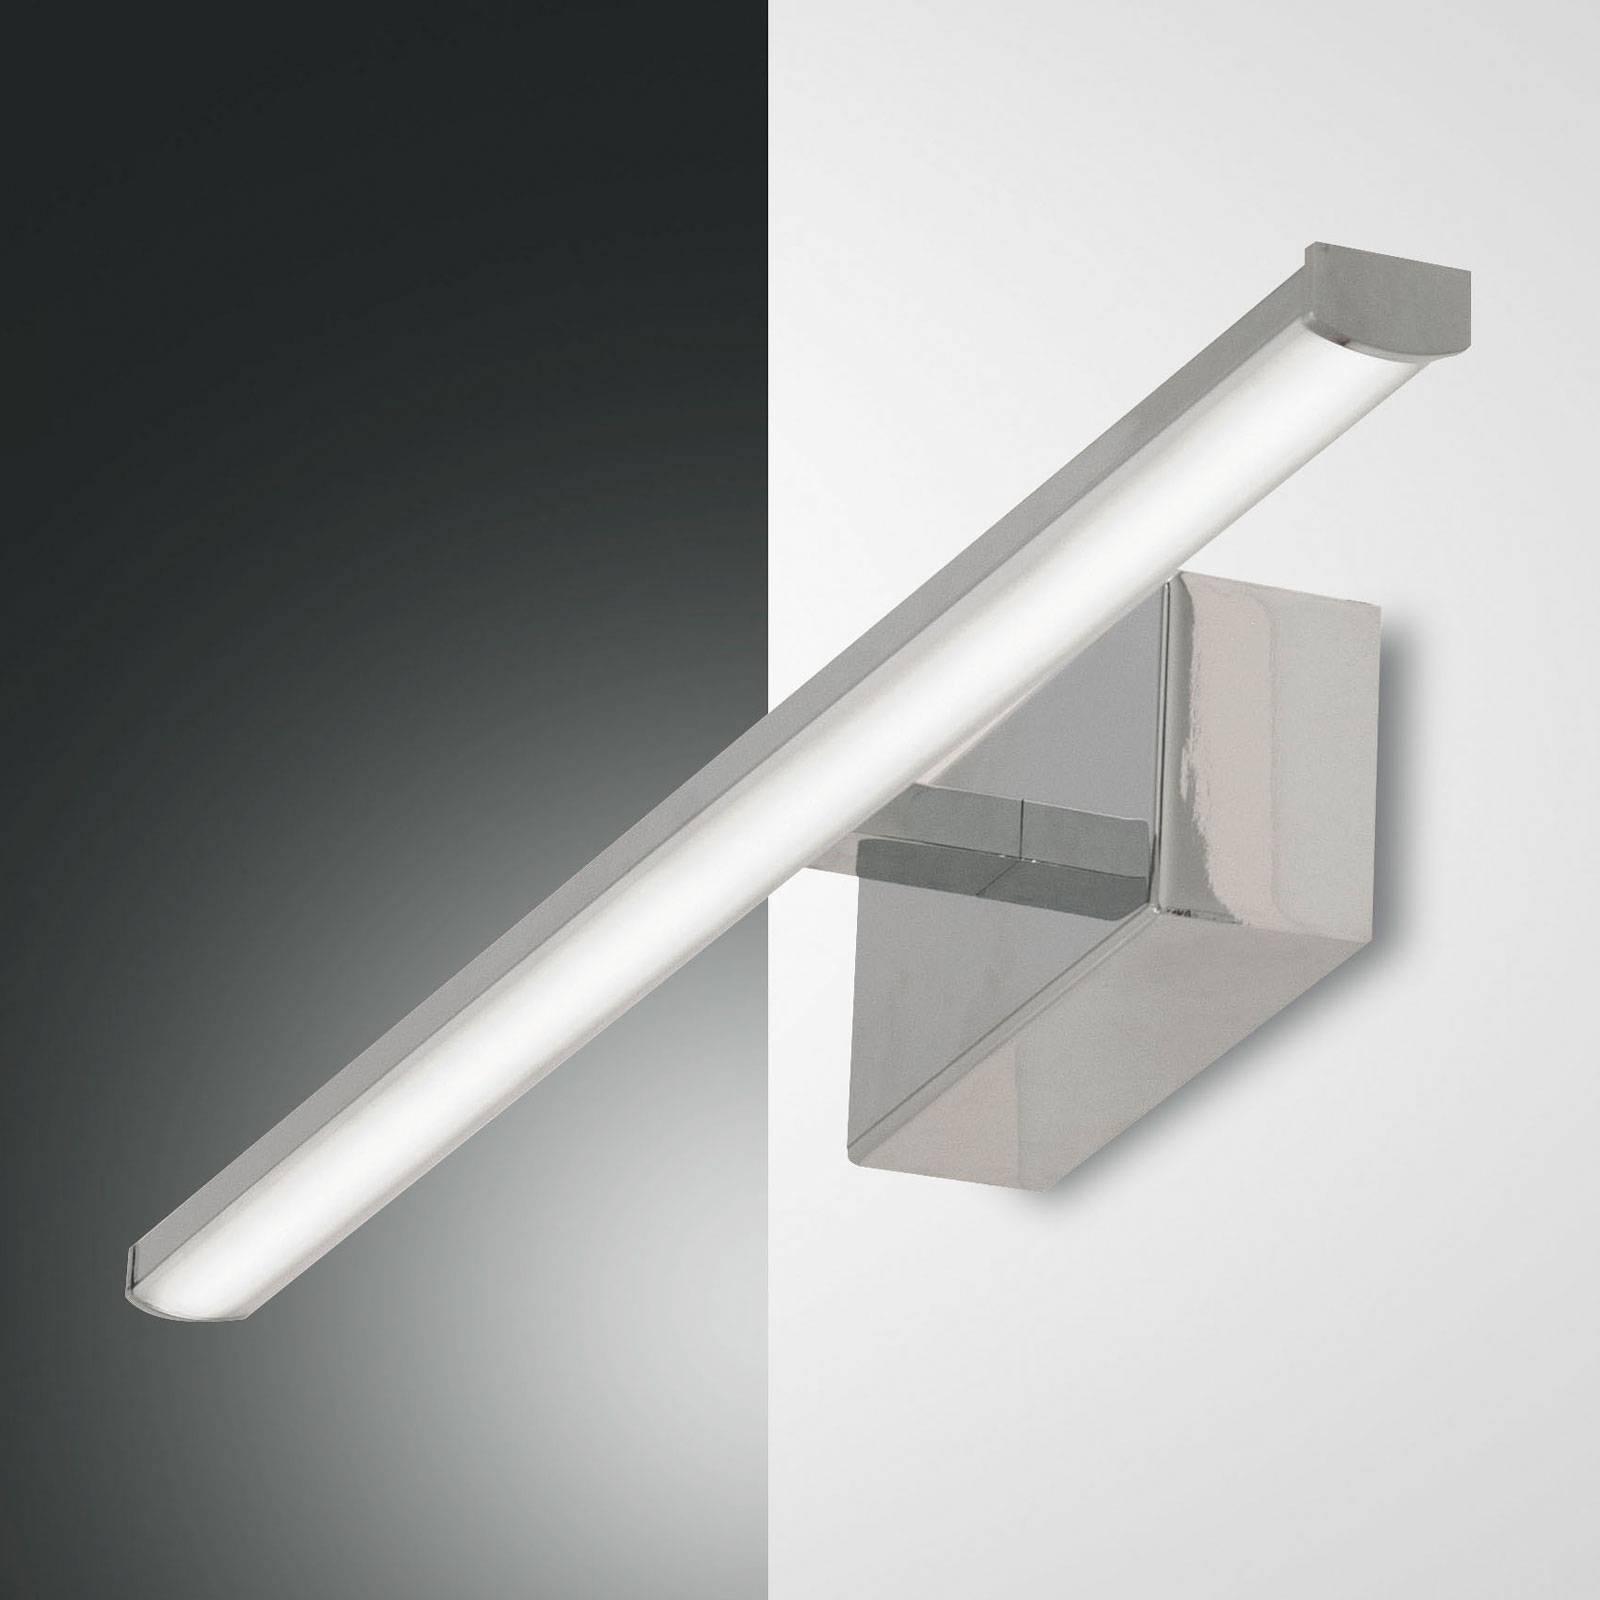 LED-Wandleuchte Nala, chrom, Breite 50 cm